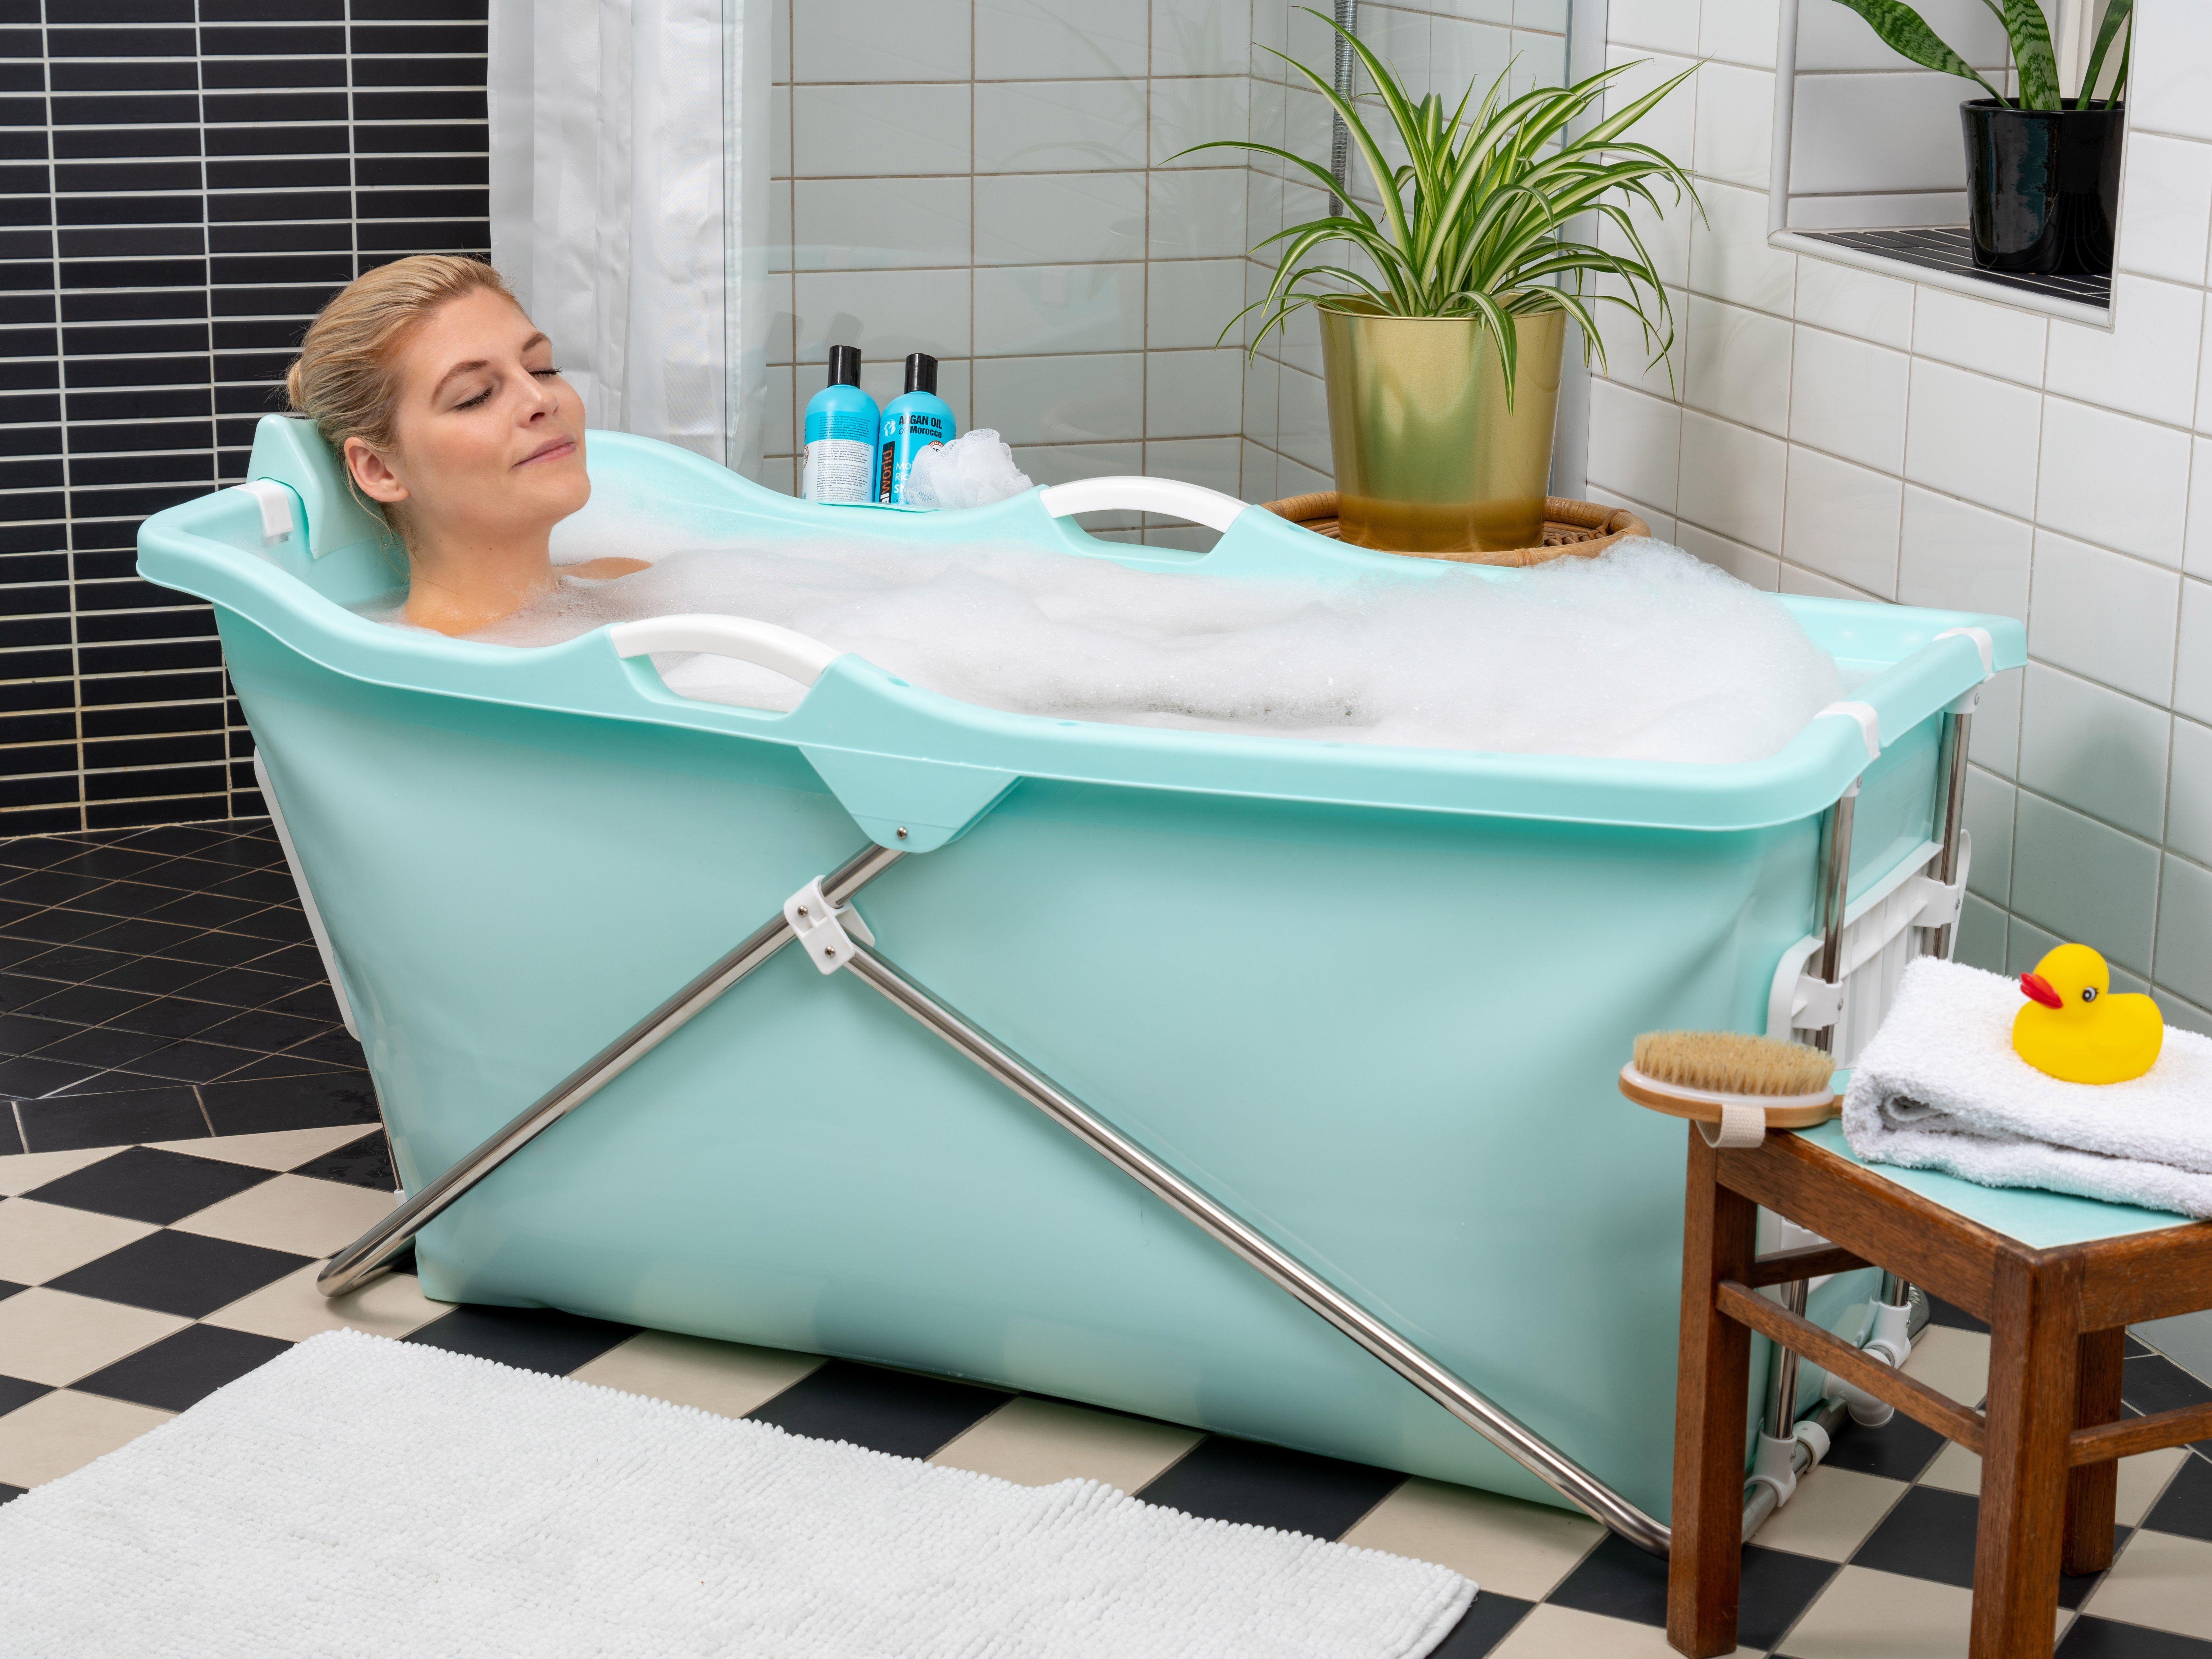 Foldable Bathtub Space Saving Bathtub For Adults Portable